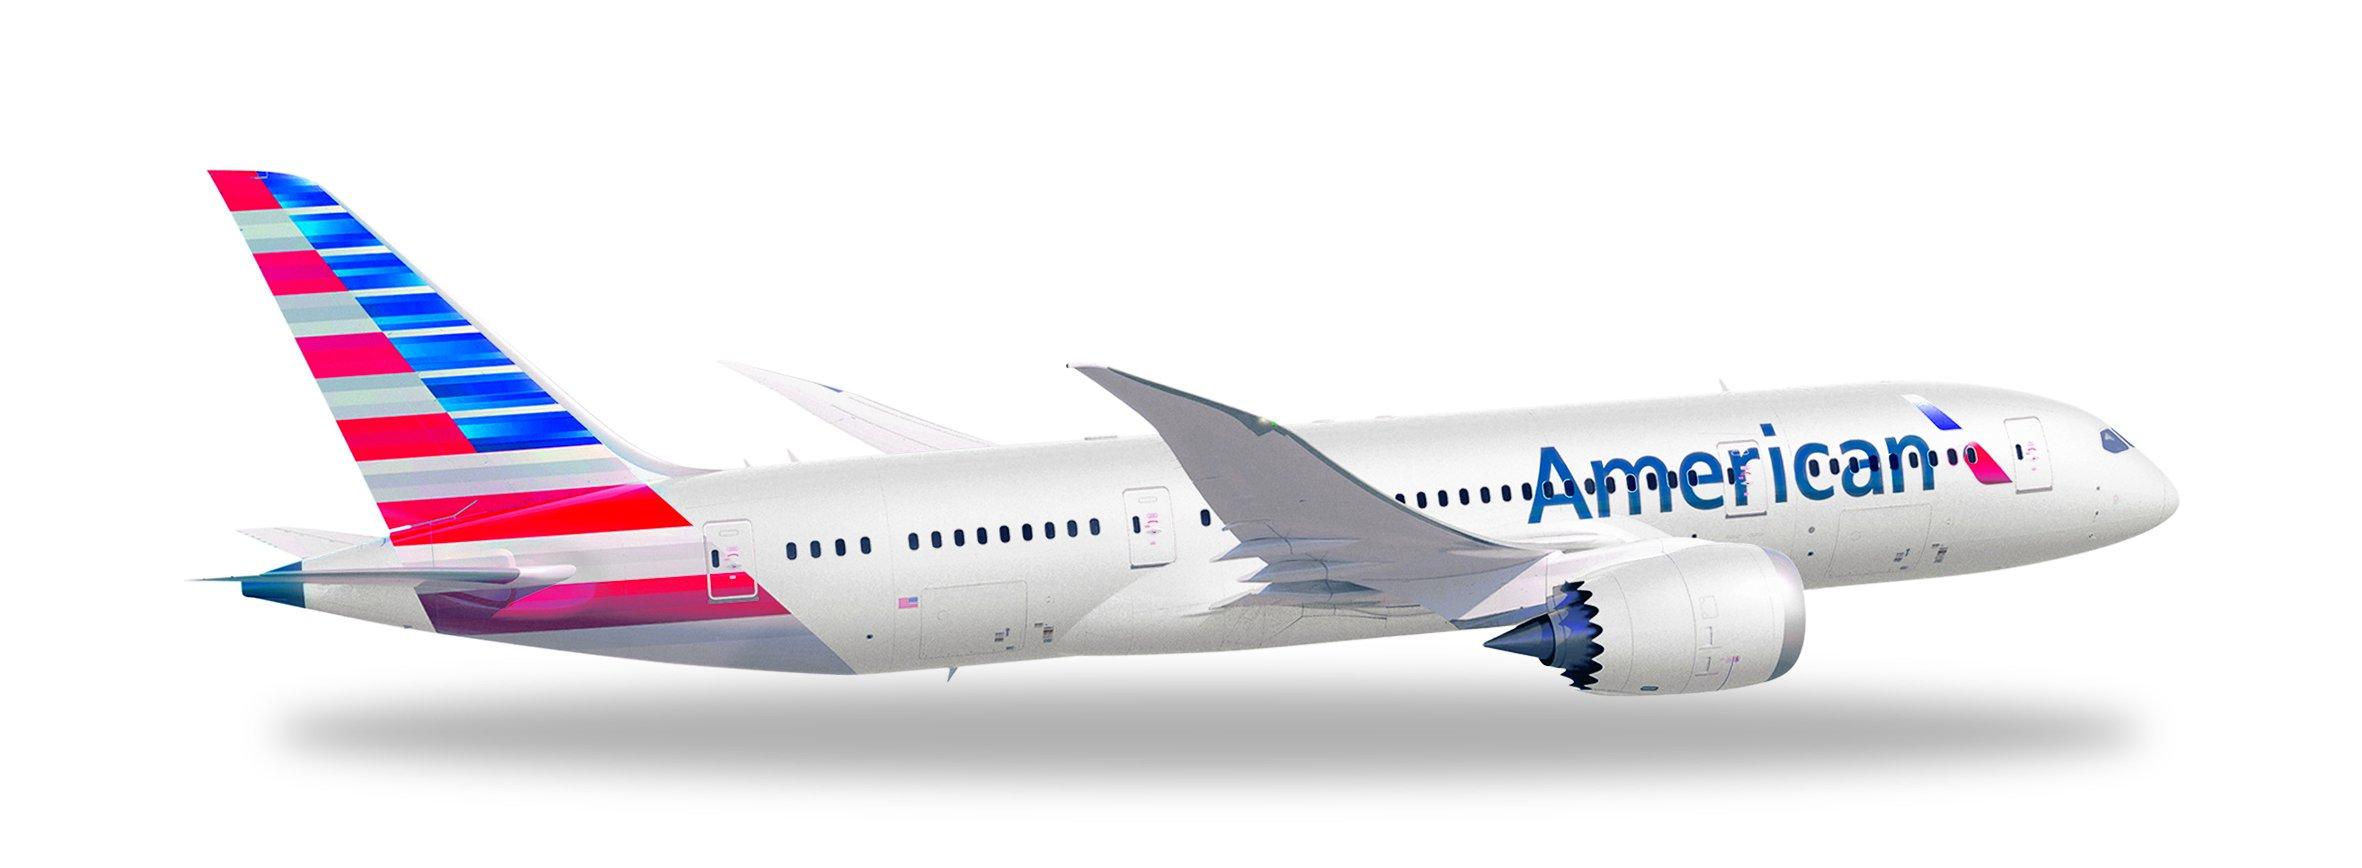 HERPA American 787-8 REG#N800AN Die Cast Aircraft (1/500 Scale)